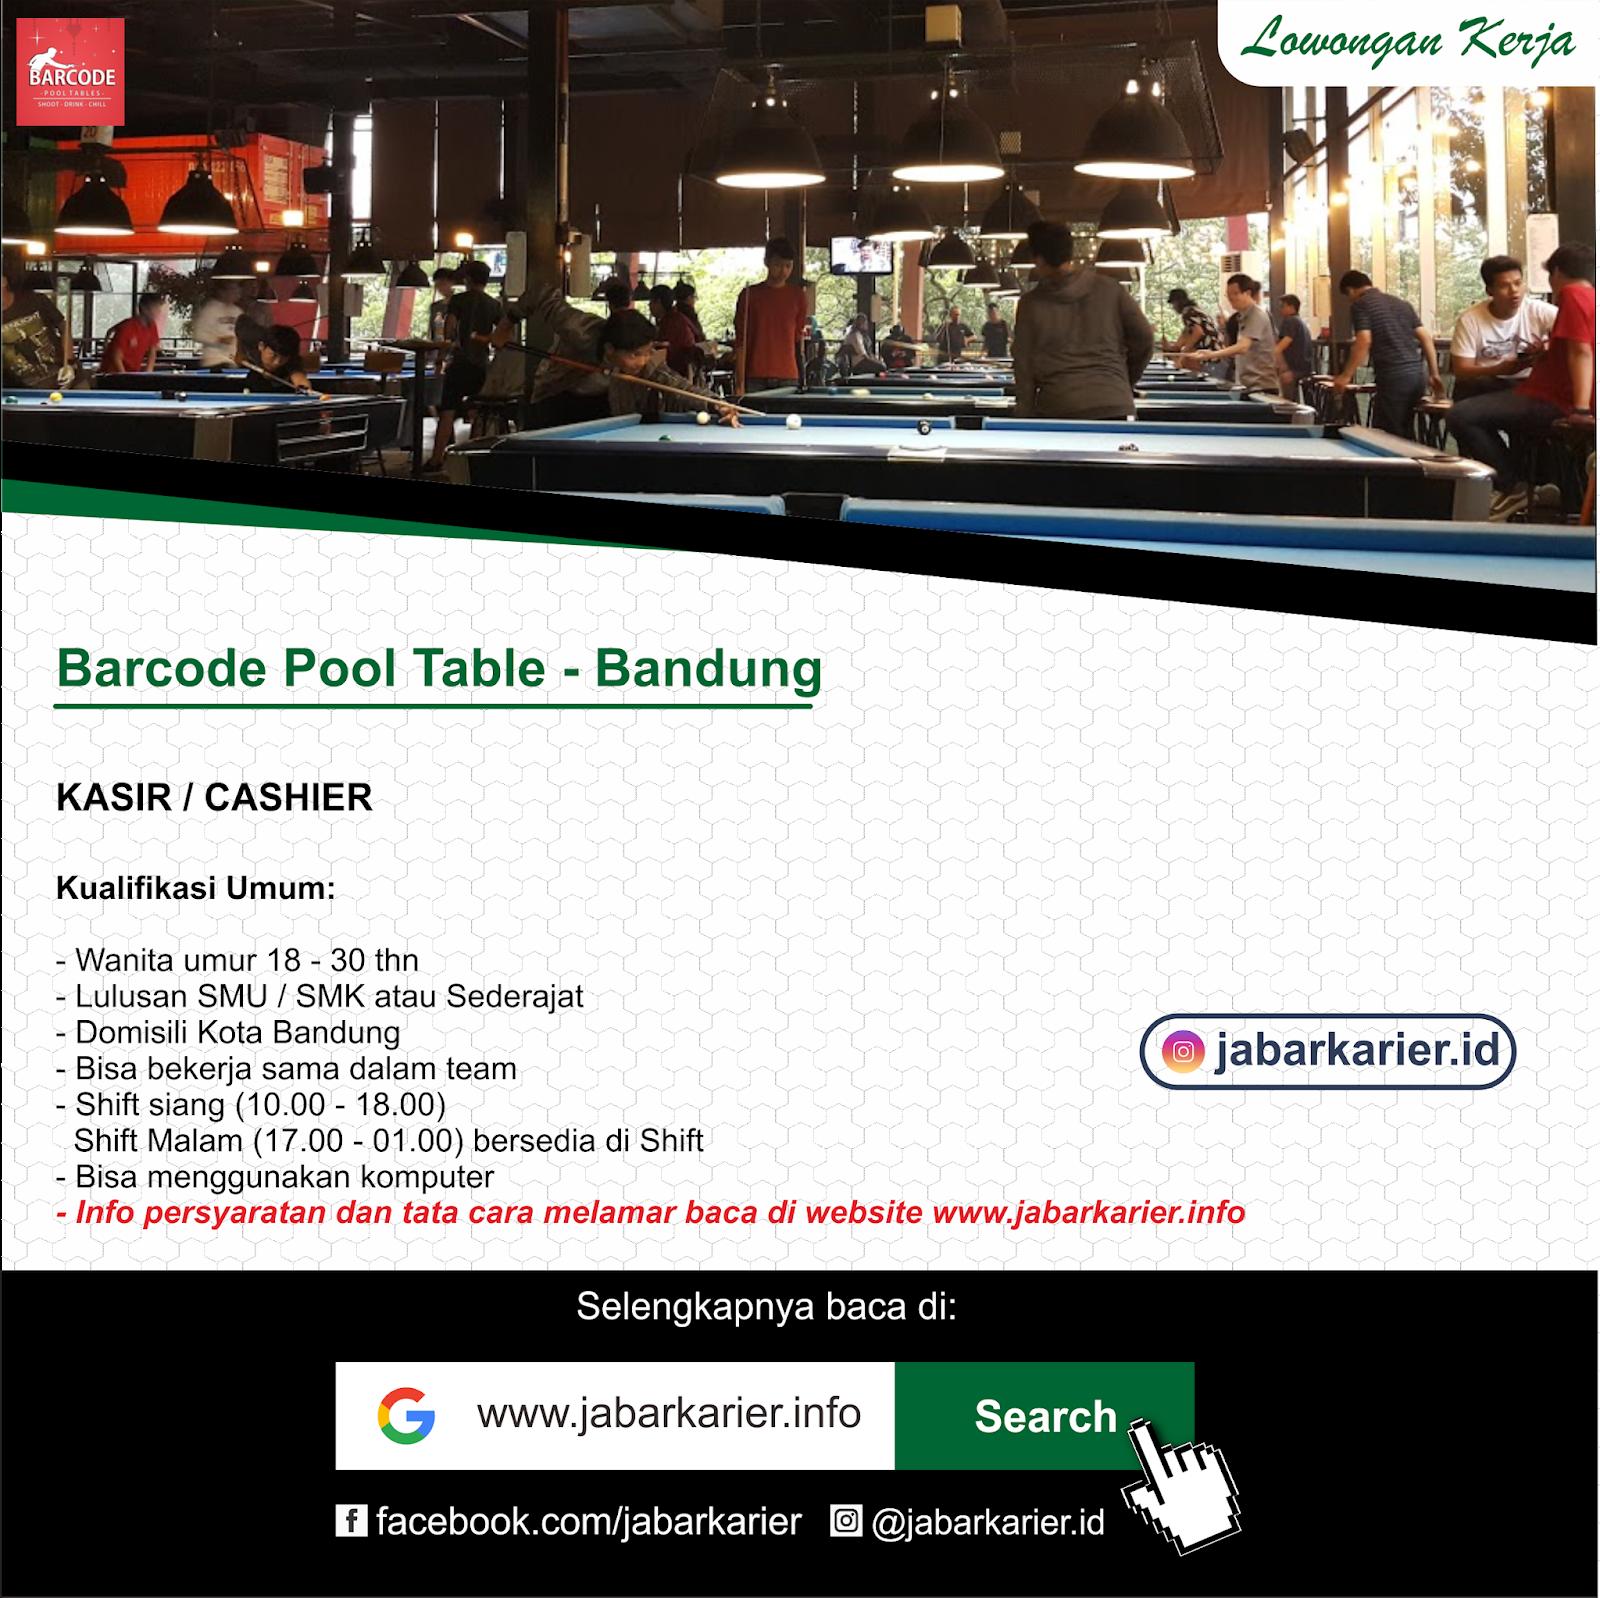 Lowongan Kasir Barcode Pool Tables Bandung Lowongan Kerja Terbaru Tahun 2020 Informasi Rekrutmen Cpns Pppk 2020